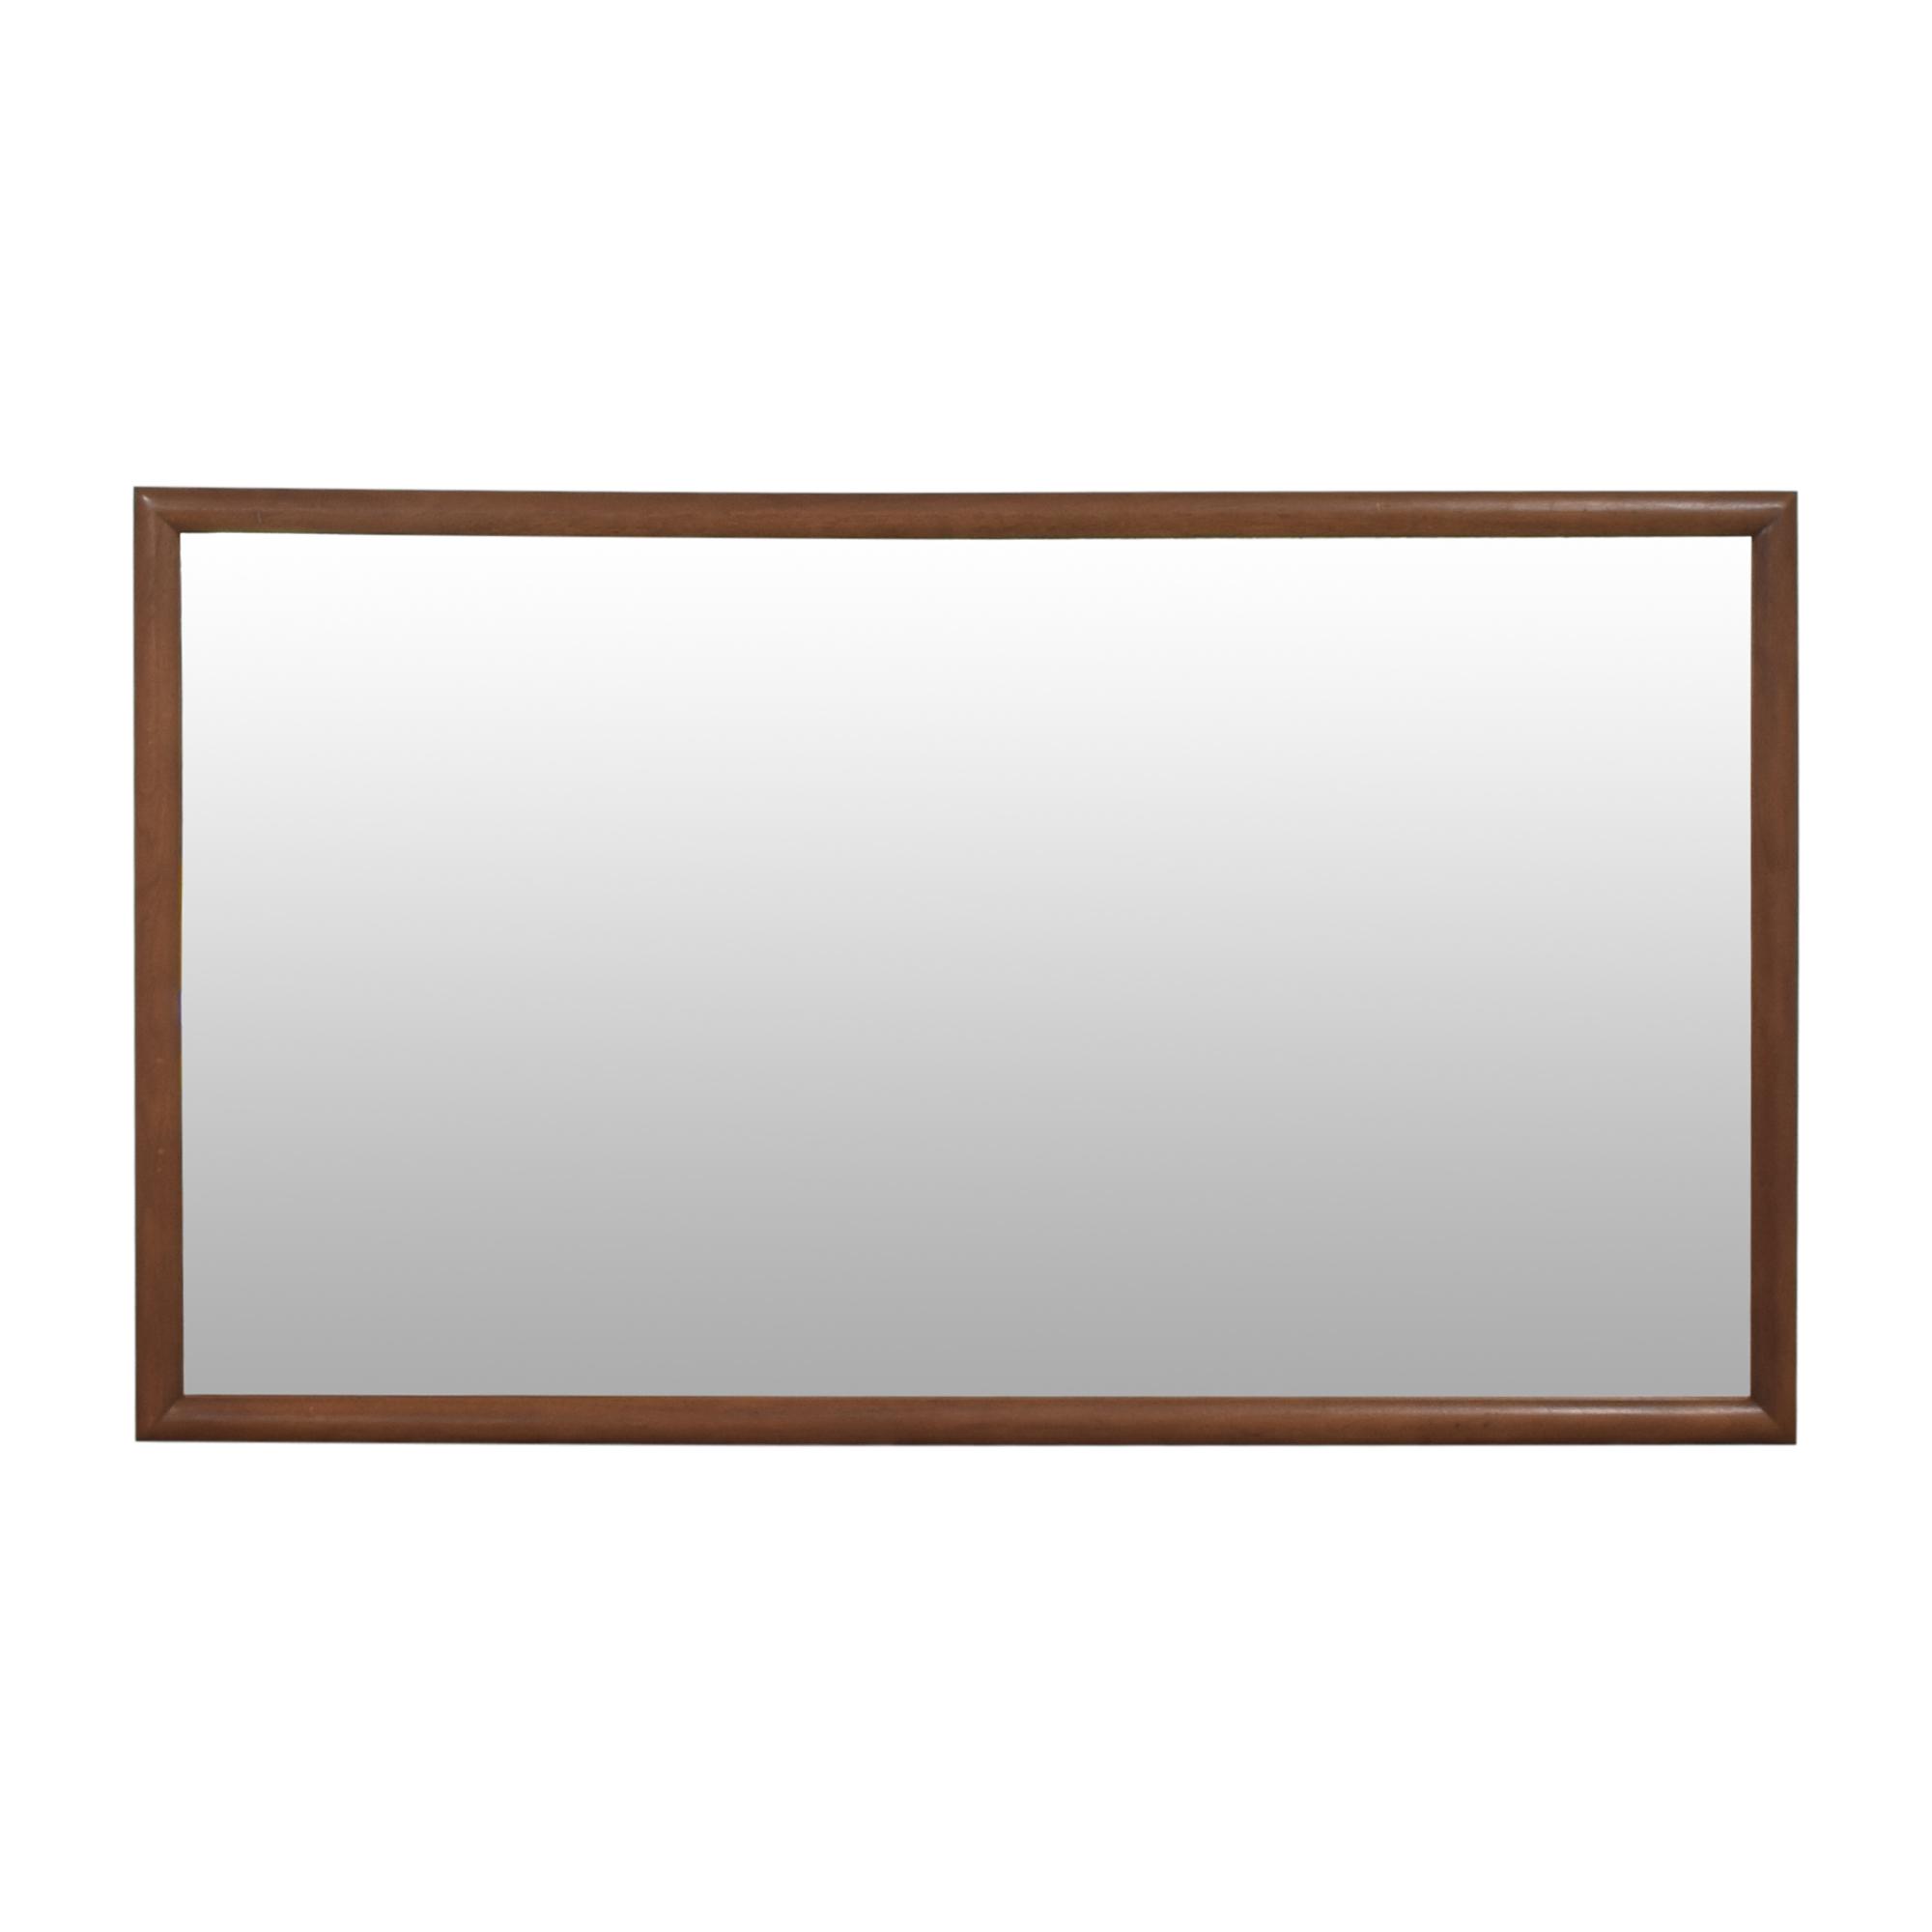 Drexel Drexel Mid Century Wall Mirror nyc